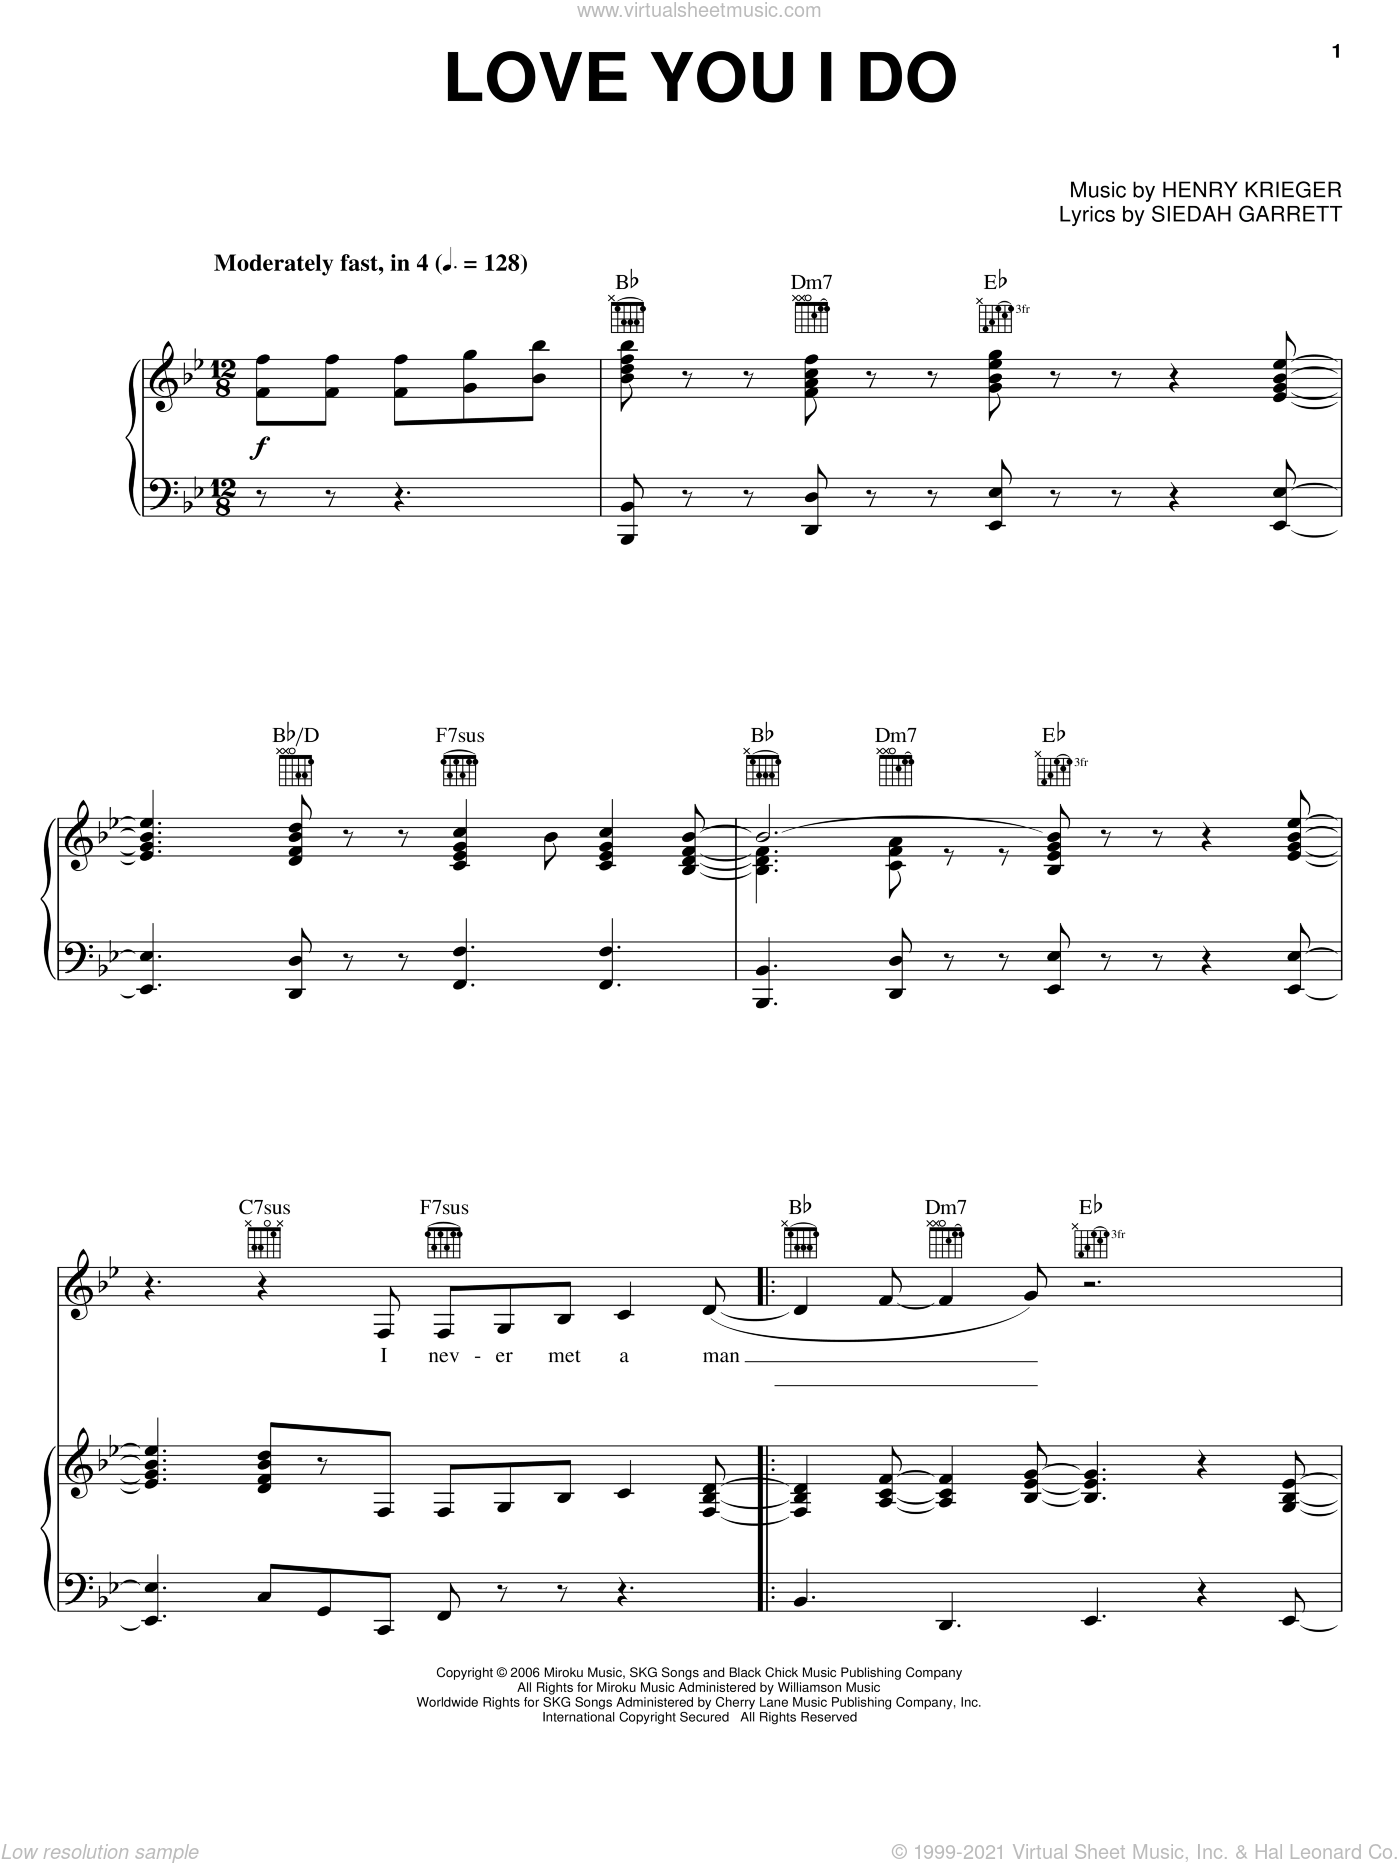 Love You I Do sheet music for voice, piano or guitar by Jennifer Hudson, Dreamgirls (Movie), Henry Krieger and Siedah Garrett, intermediate skill level